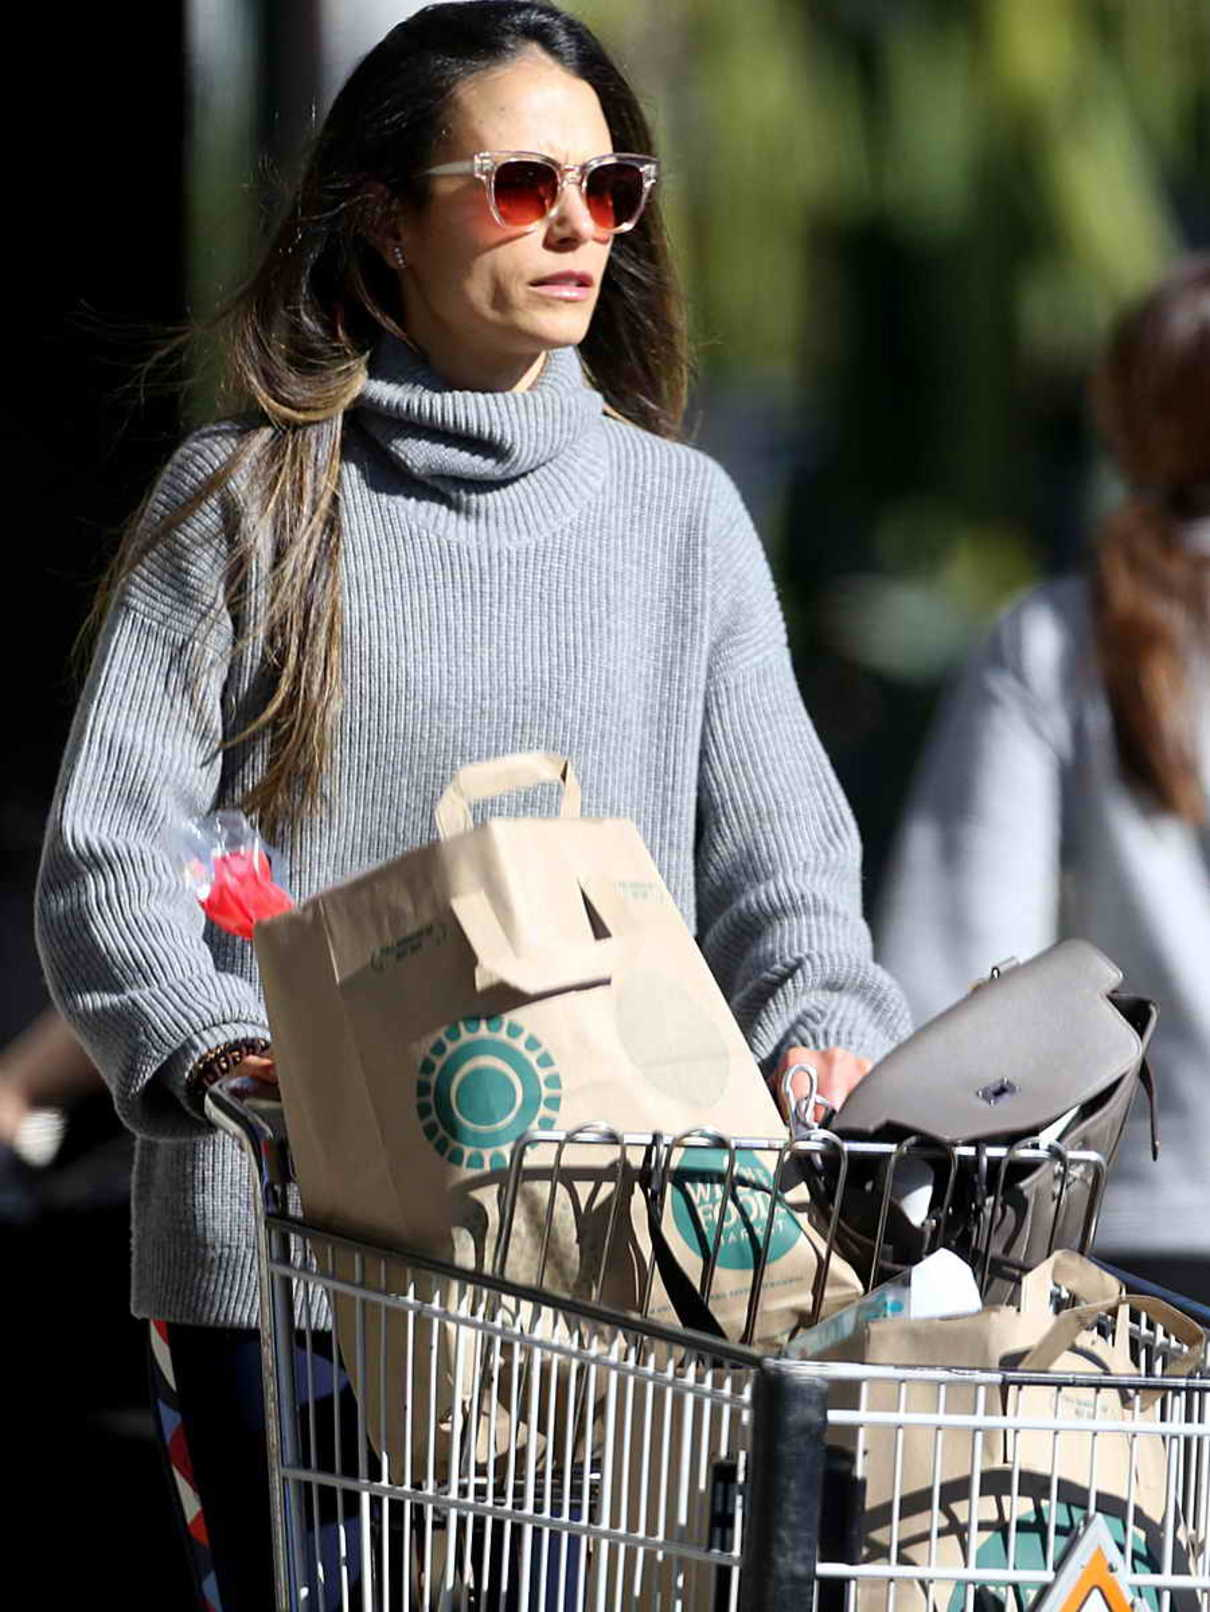 Jordana Brewster in a Gray Sweater